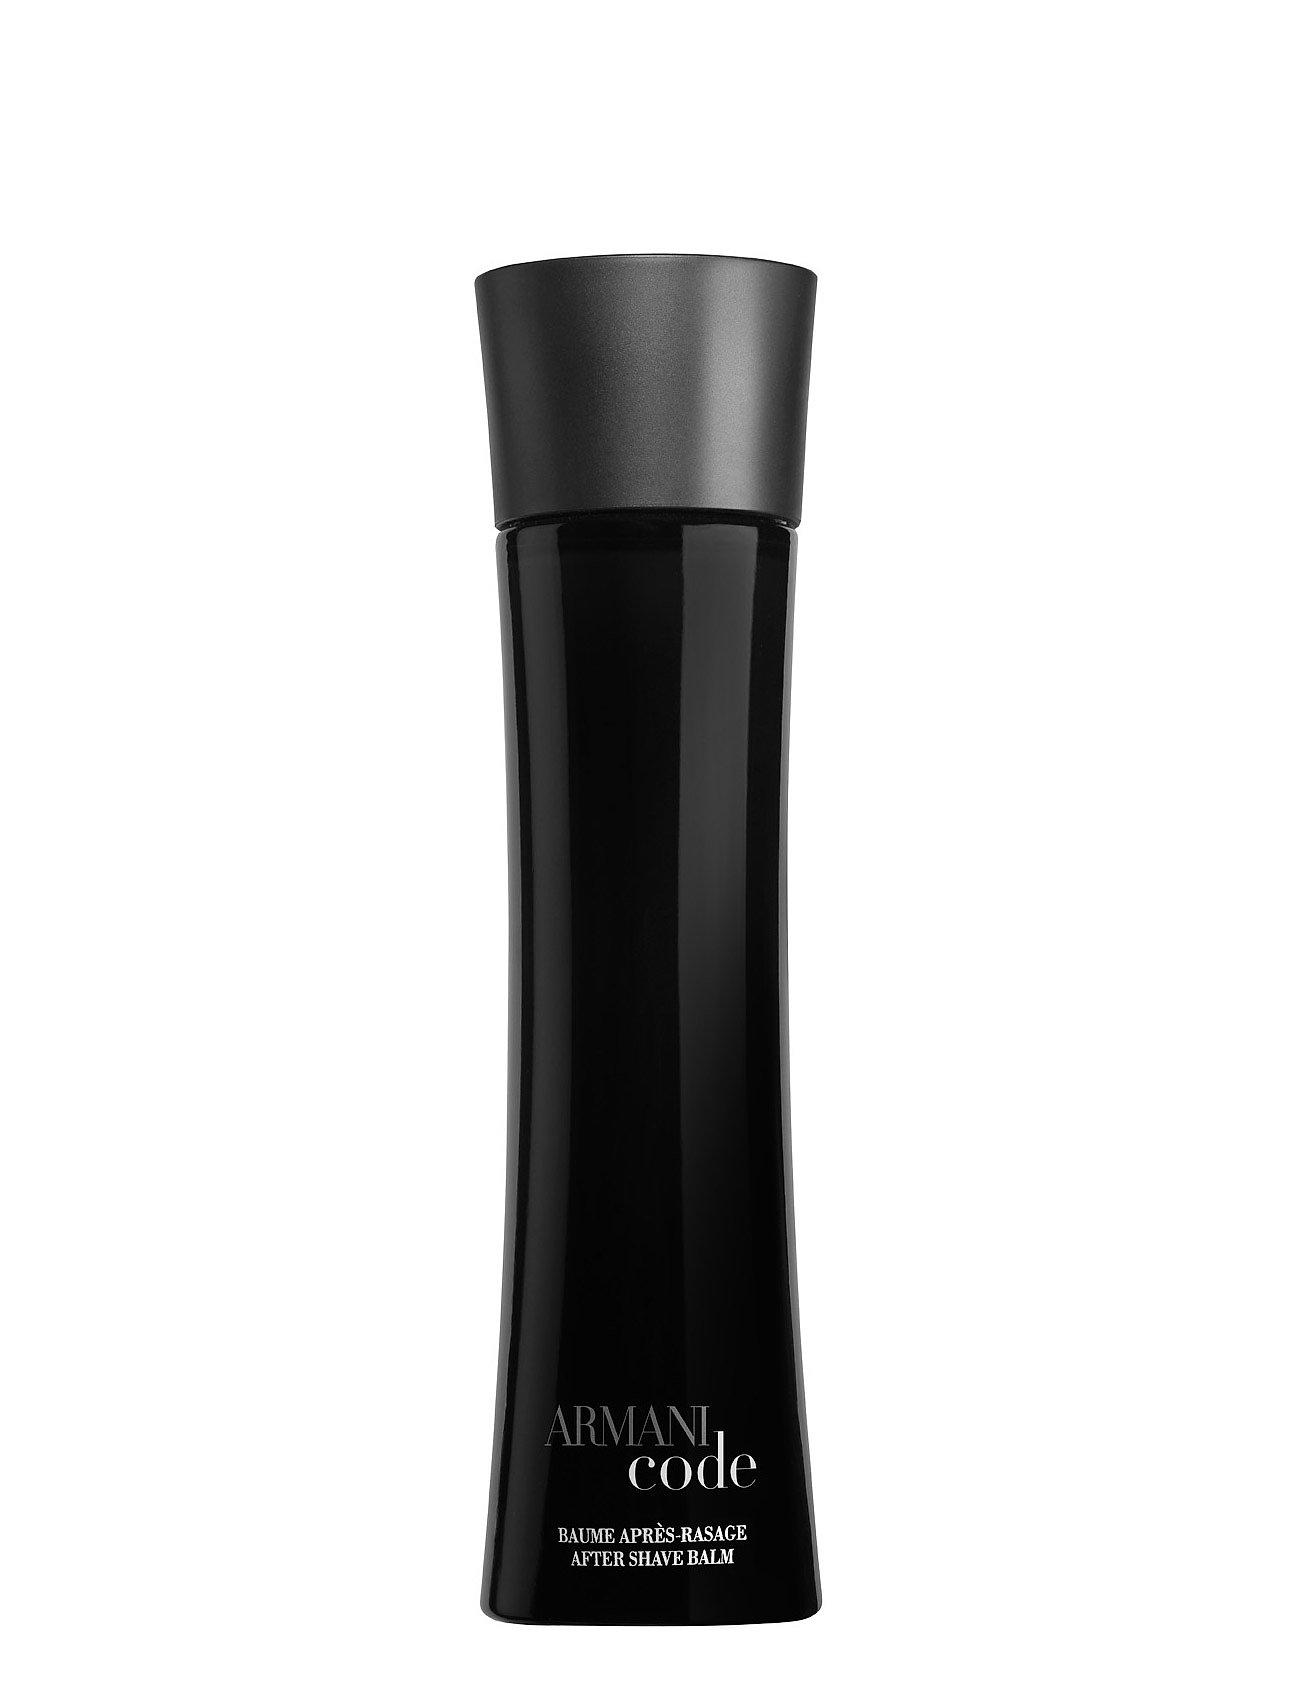 giorgio armani – Armani code men after shave balm 100 ml fra boozt.com dk